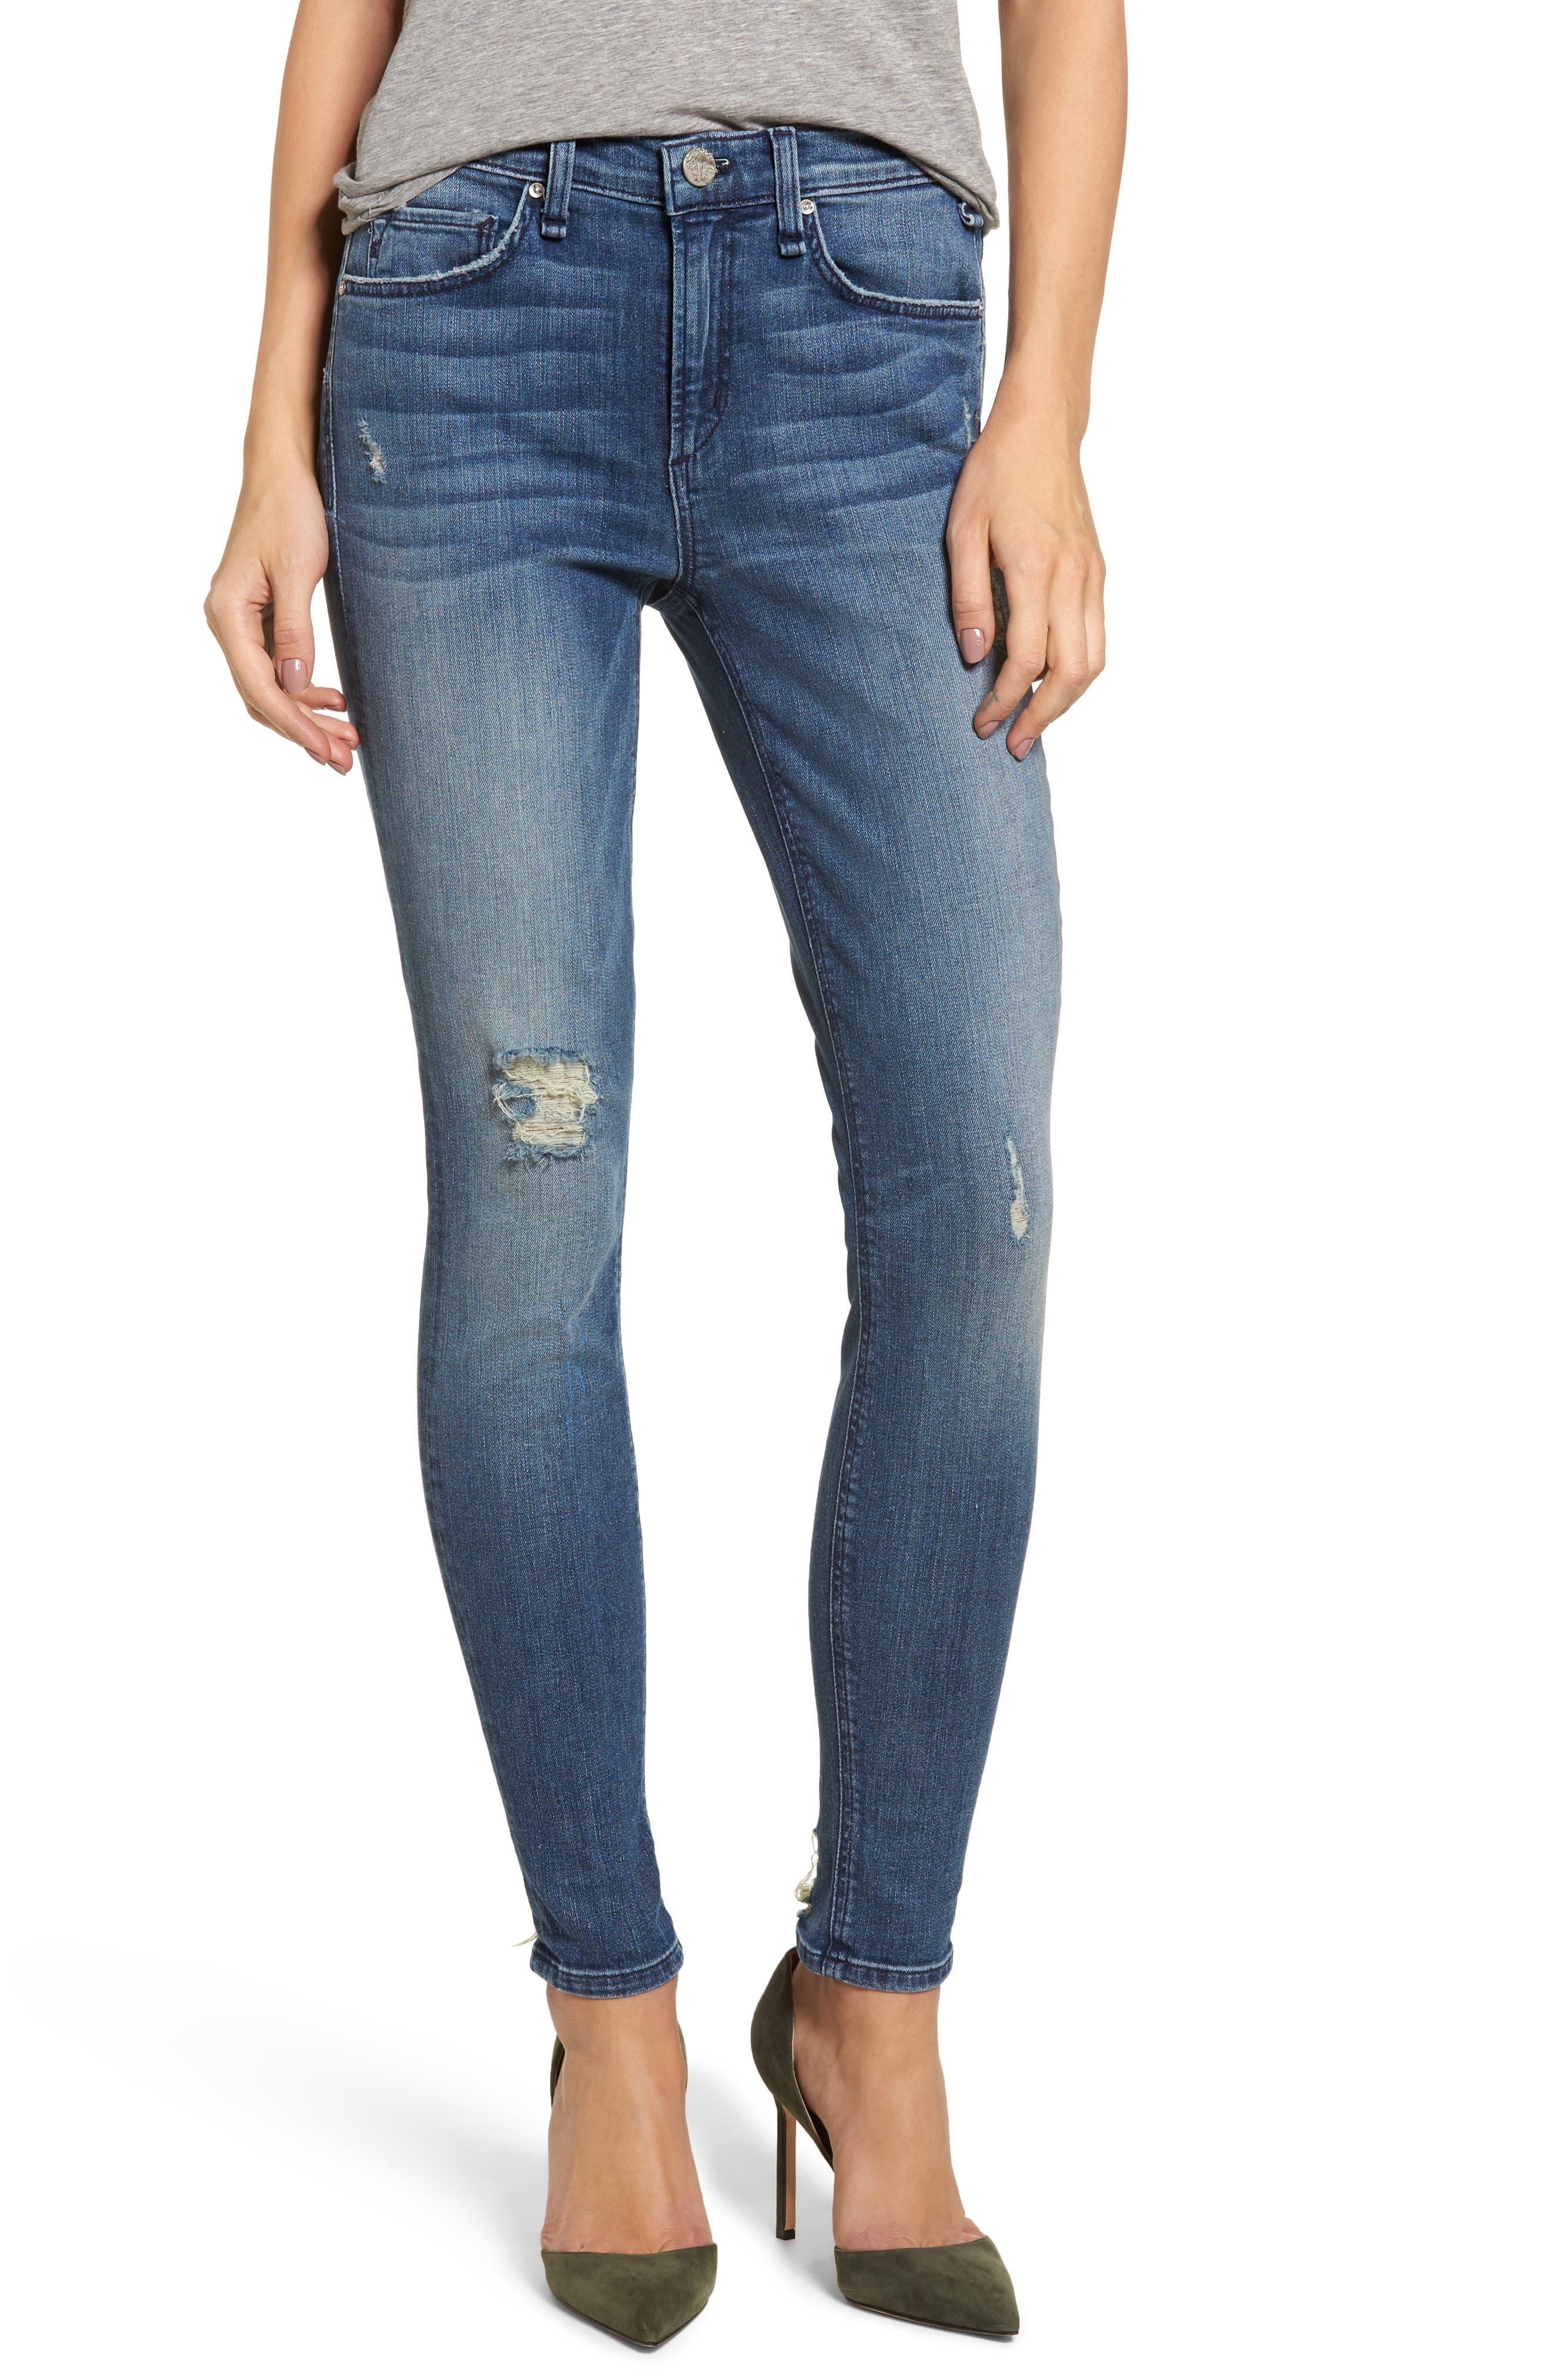 McGuire Newton High Waist Skinny Jeans (Lumene)